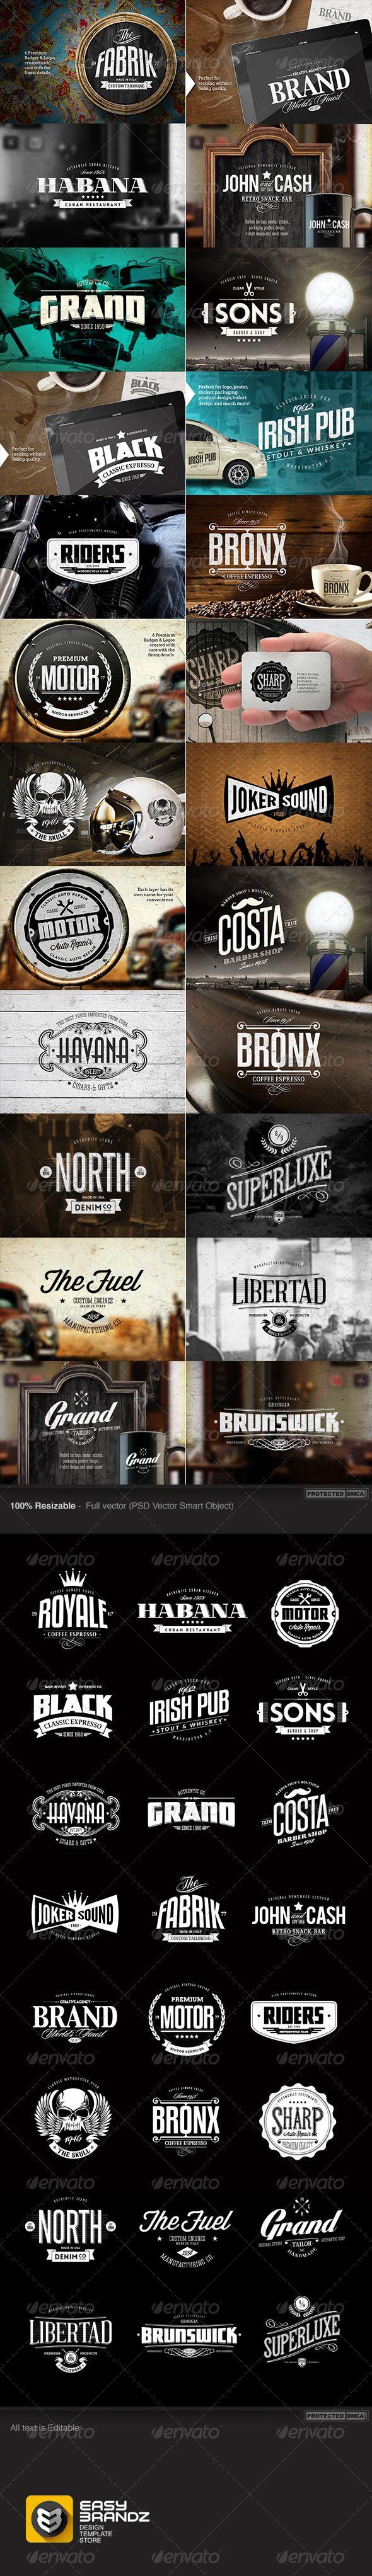 24 Badges & Logos Bundle | Buy and Download: http://graphicriver.net/item/24-badges-logos-bundle/7103911?WT.ac=category_thumb&WT.z_author=Easybrandz2&ref=ksioks